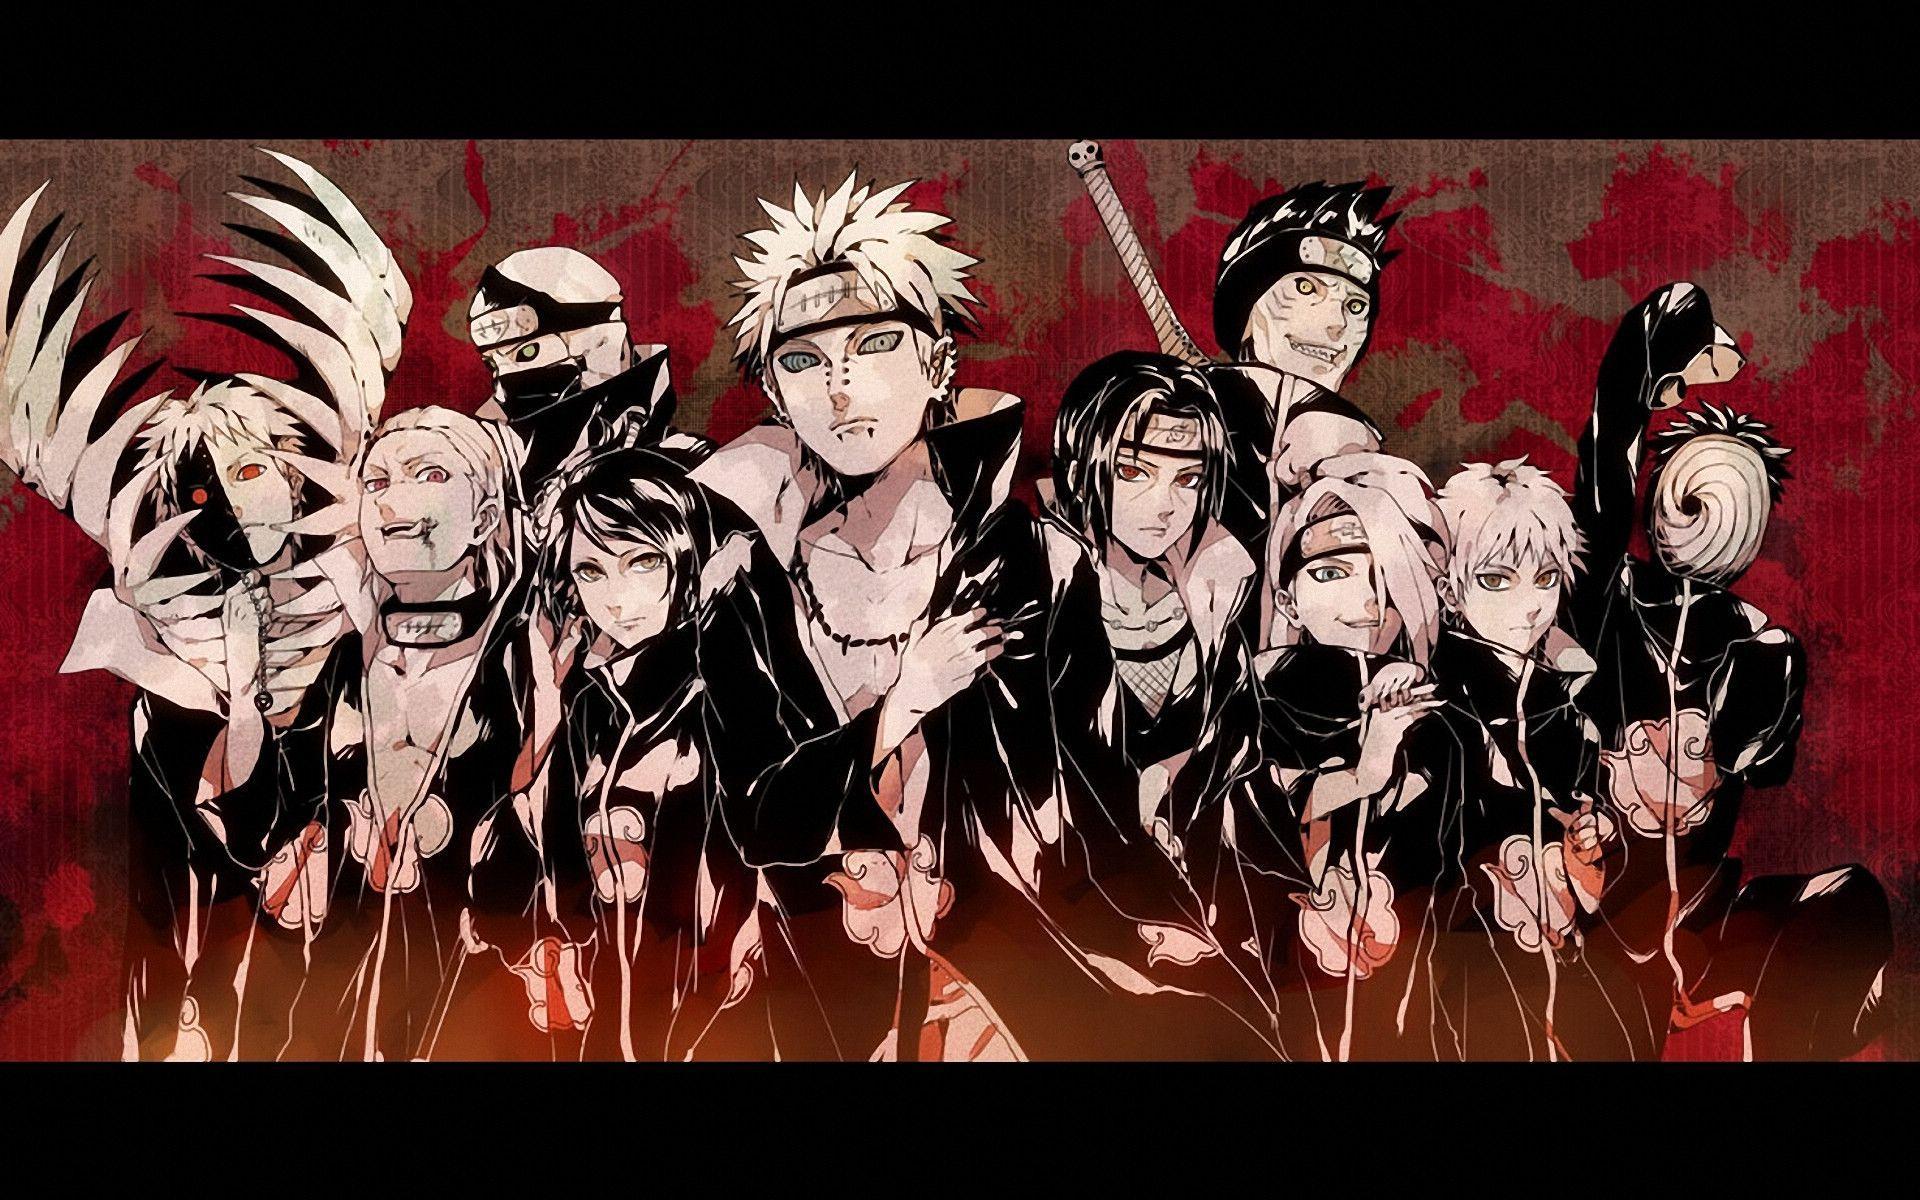 Naruto Hd Wallpapers For Windows 10 Top Anime Wallpaper